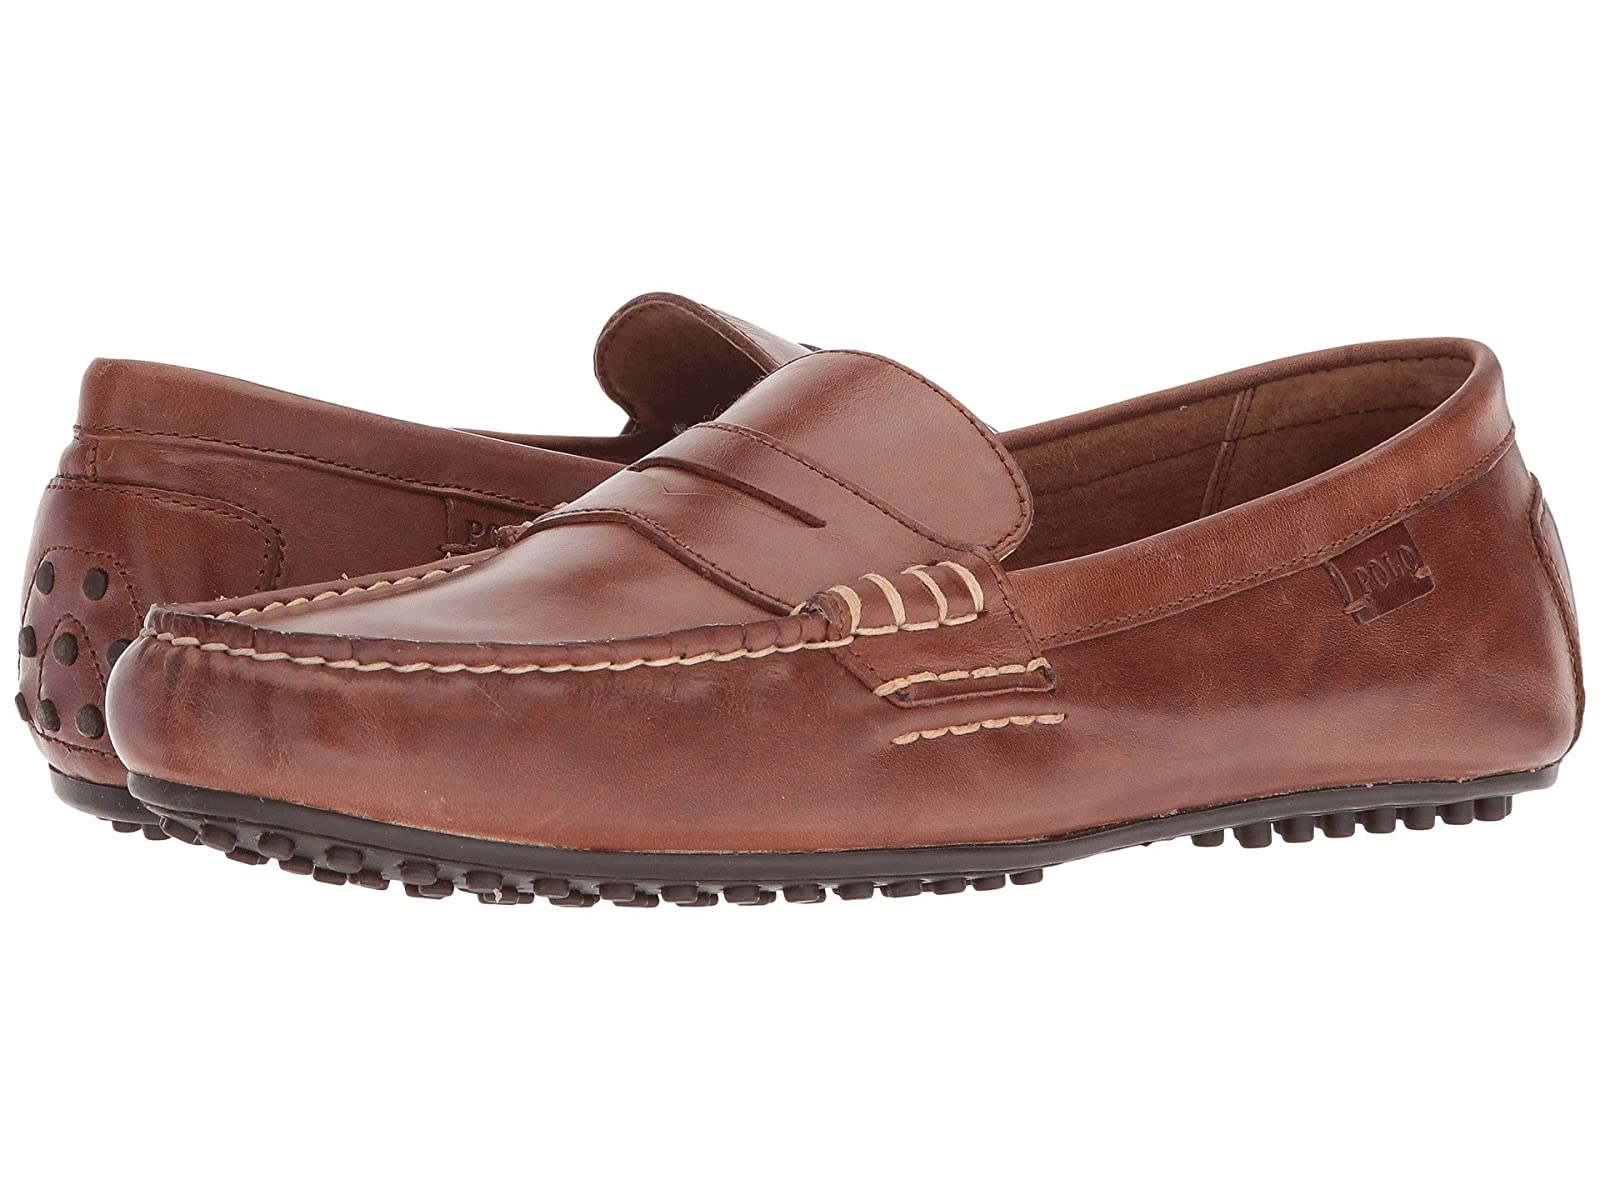 Polo Ralph Lauren WesAtmospheric grades have affordable shoes